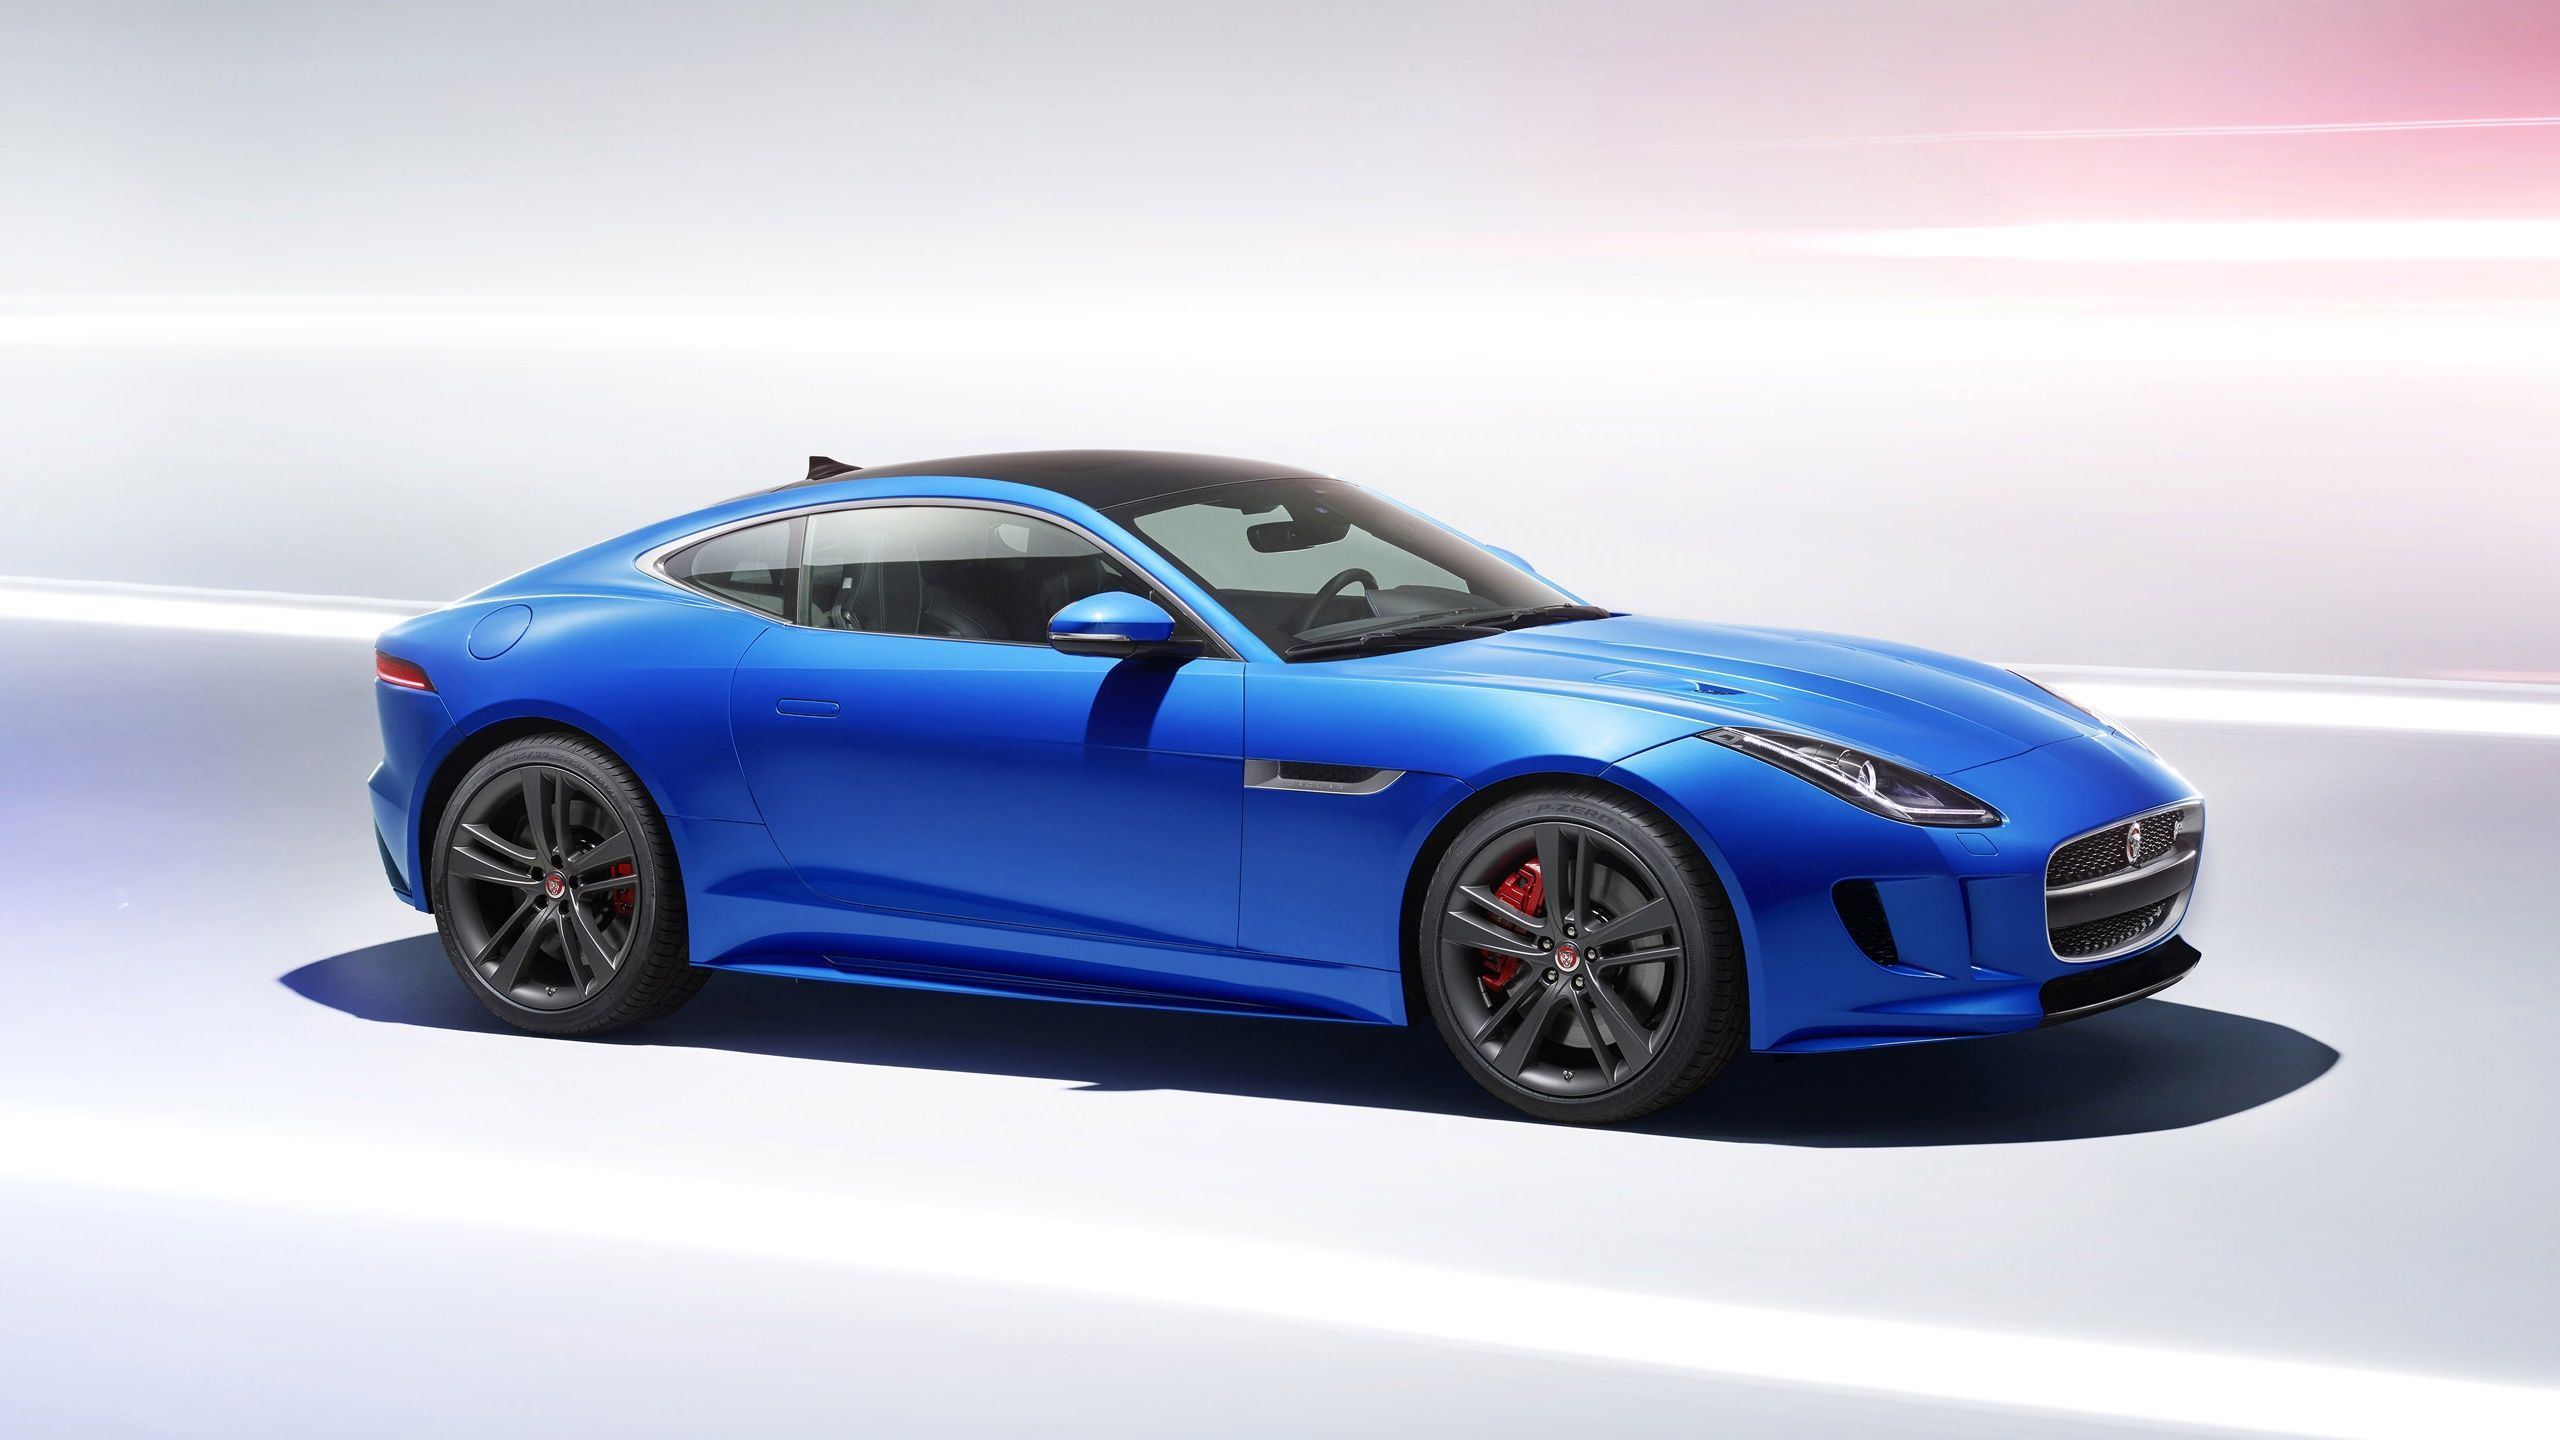 13057 - ¿Cuál es tu coche ideal?